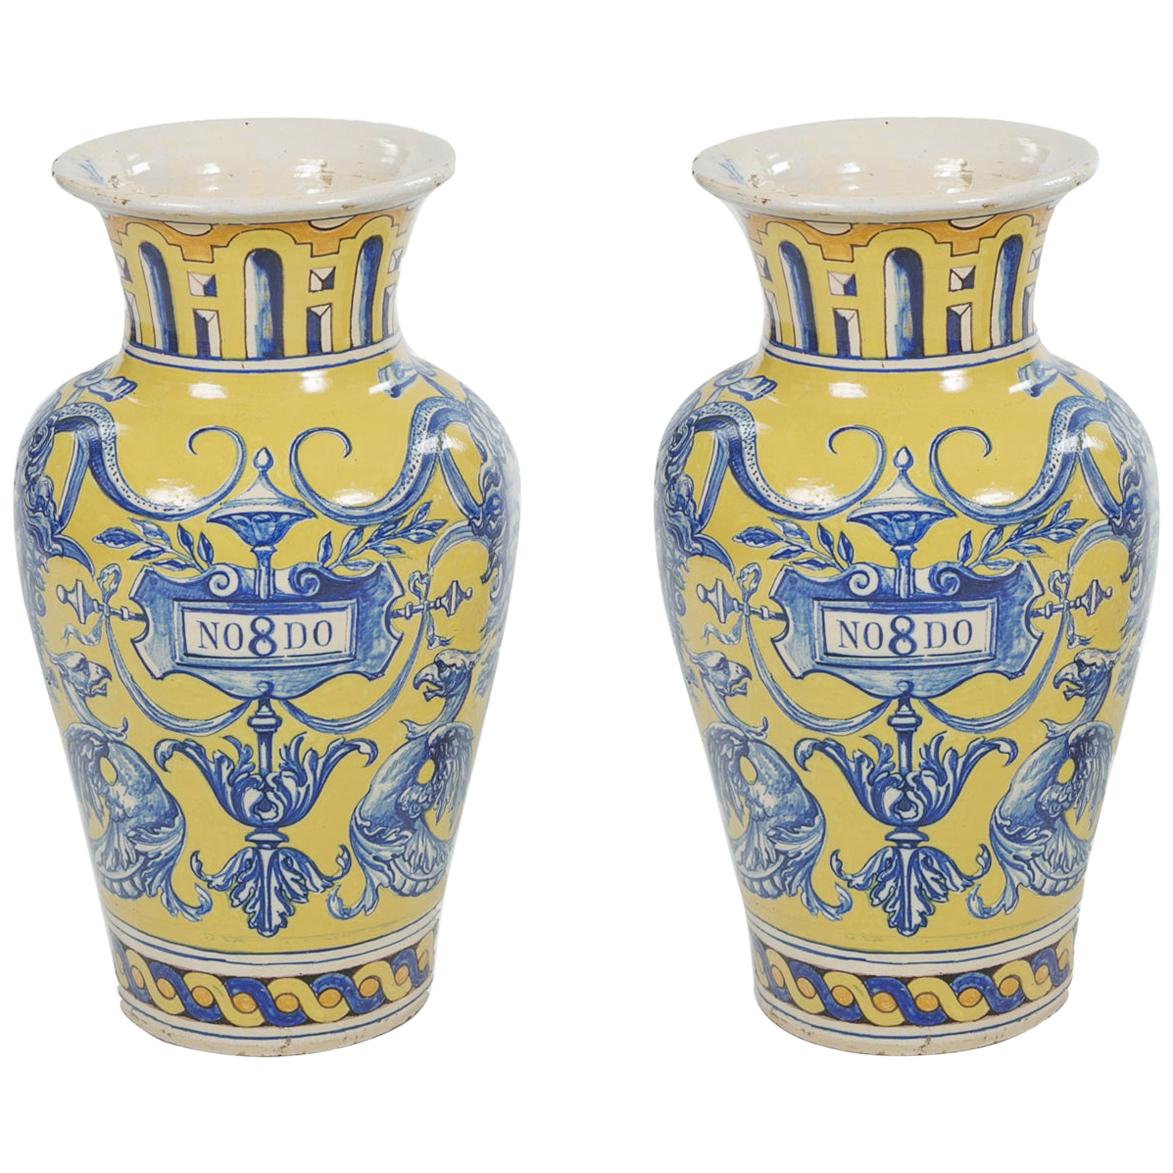 19th Century Spanish Pair of Urns, Talavera Dela Reina Pottery, Stamped 1899